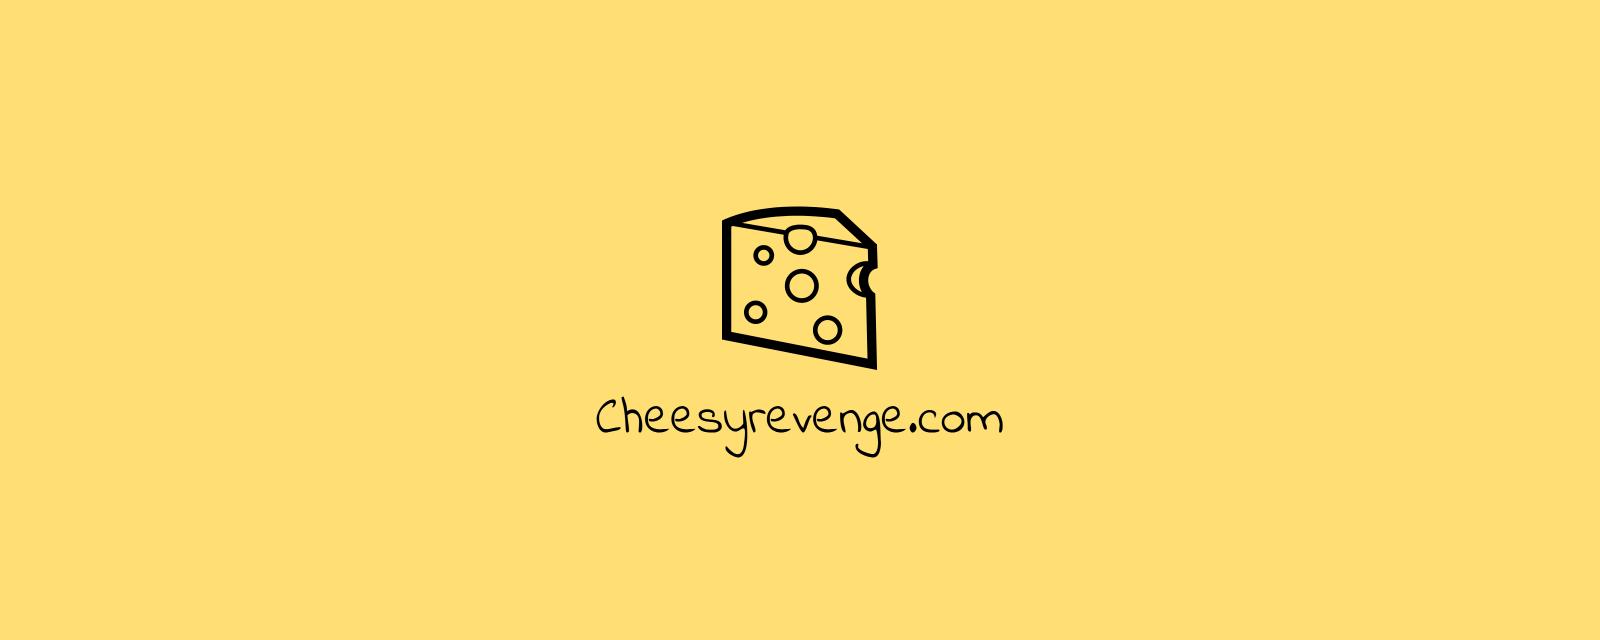 cheesy_revenge_twitter